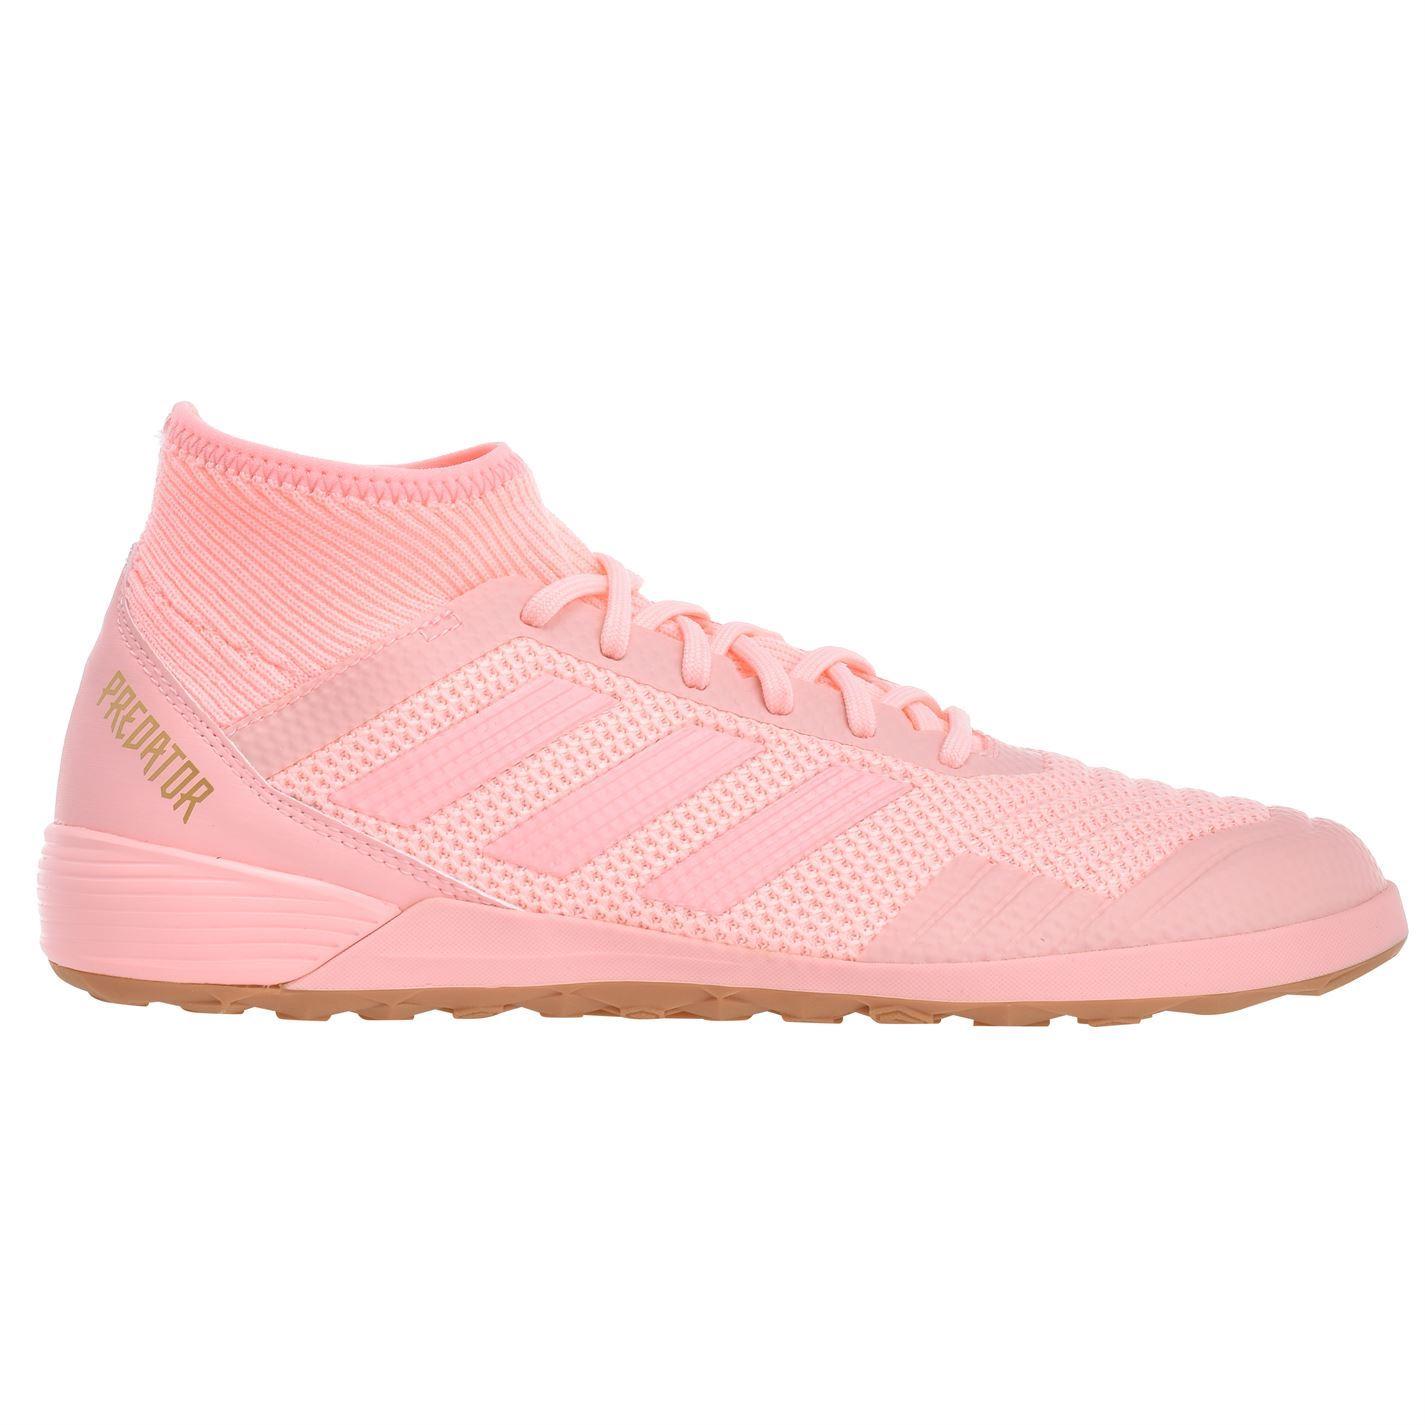 0343647990c ... adidas Predator Tango 18.3 Indoor Football Trainers Mens Soccer Futsal  Shoes ...